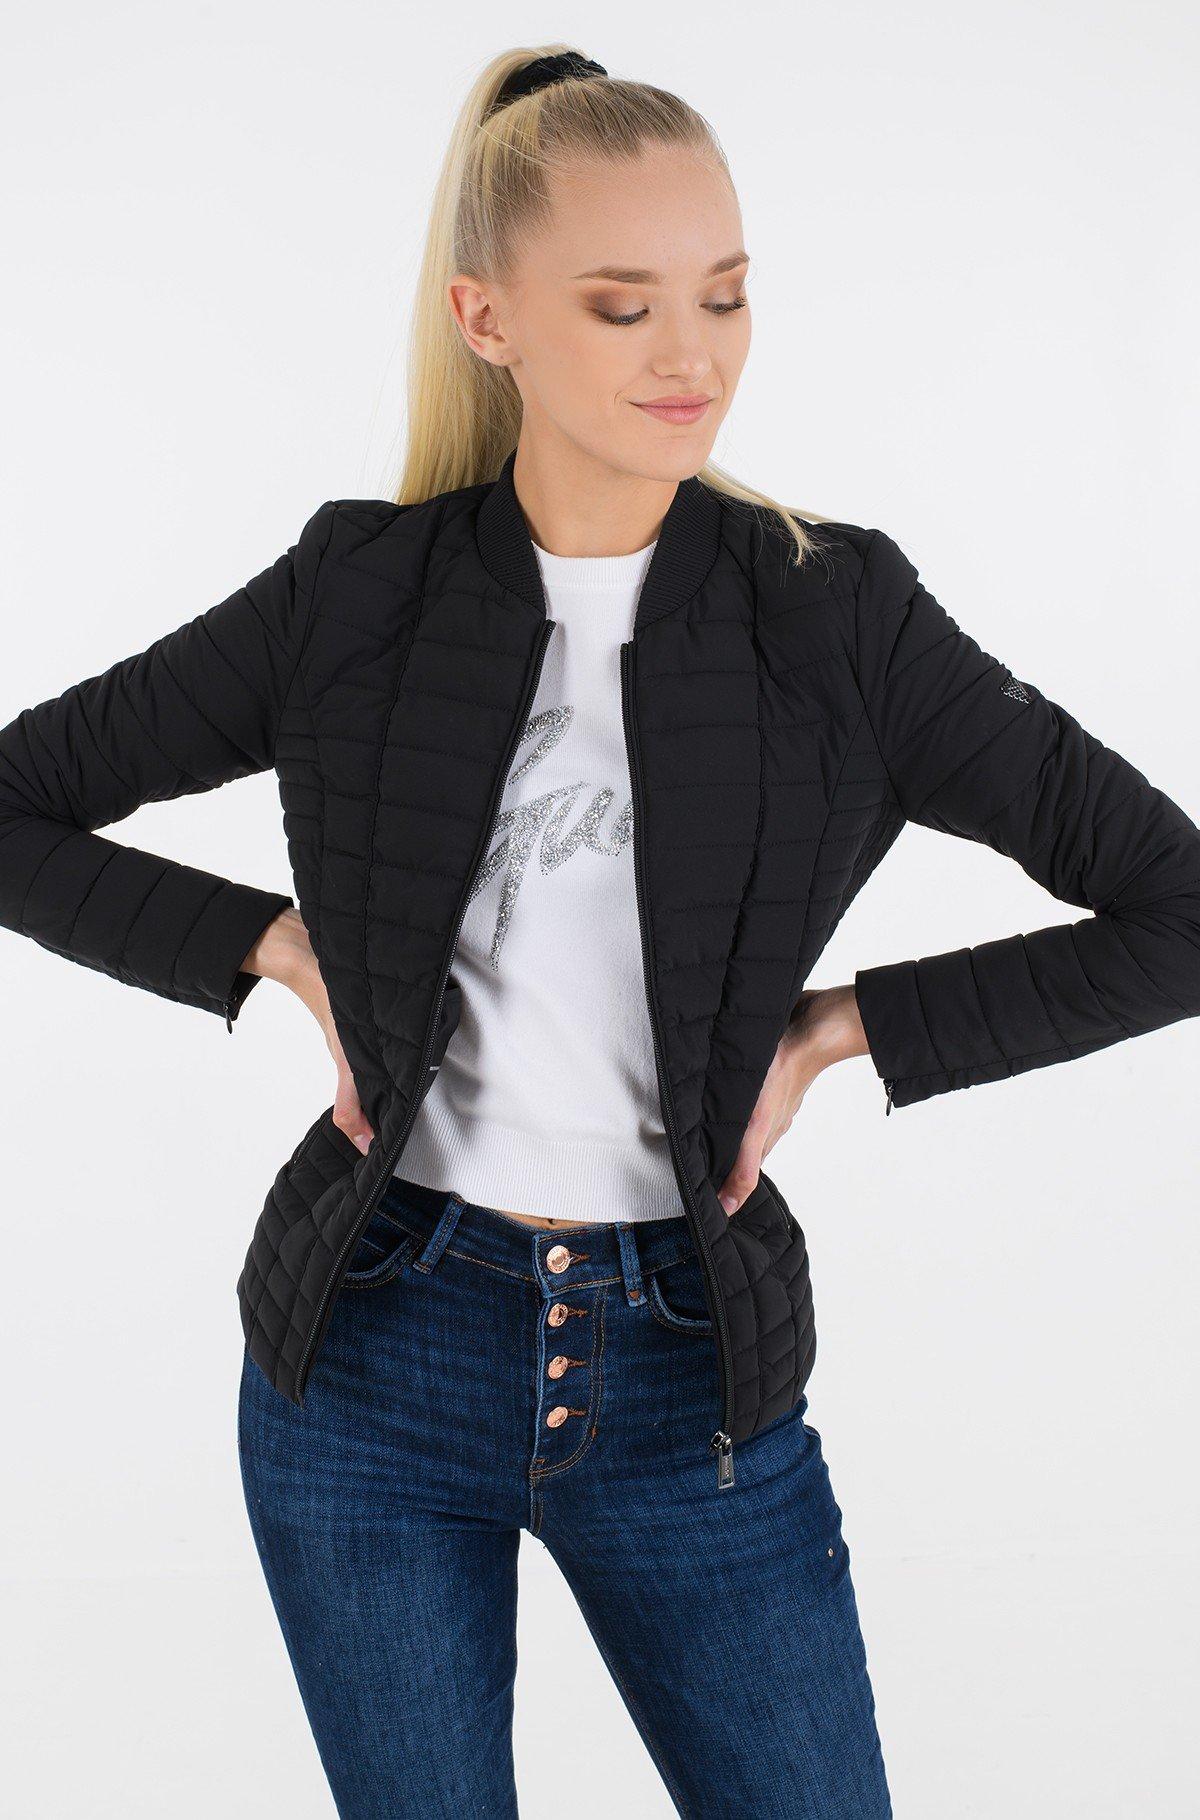 Jacket W1RL52 WCOG0 -full-1